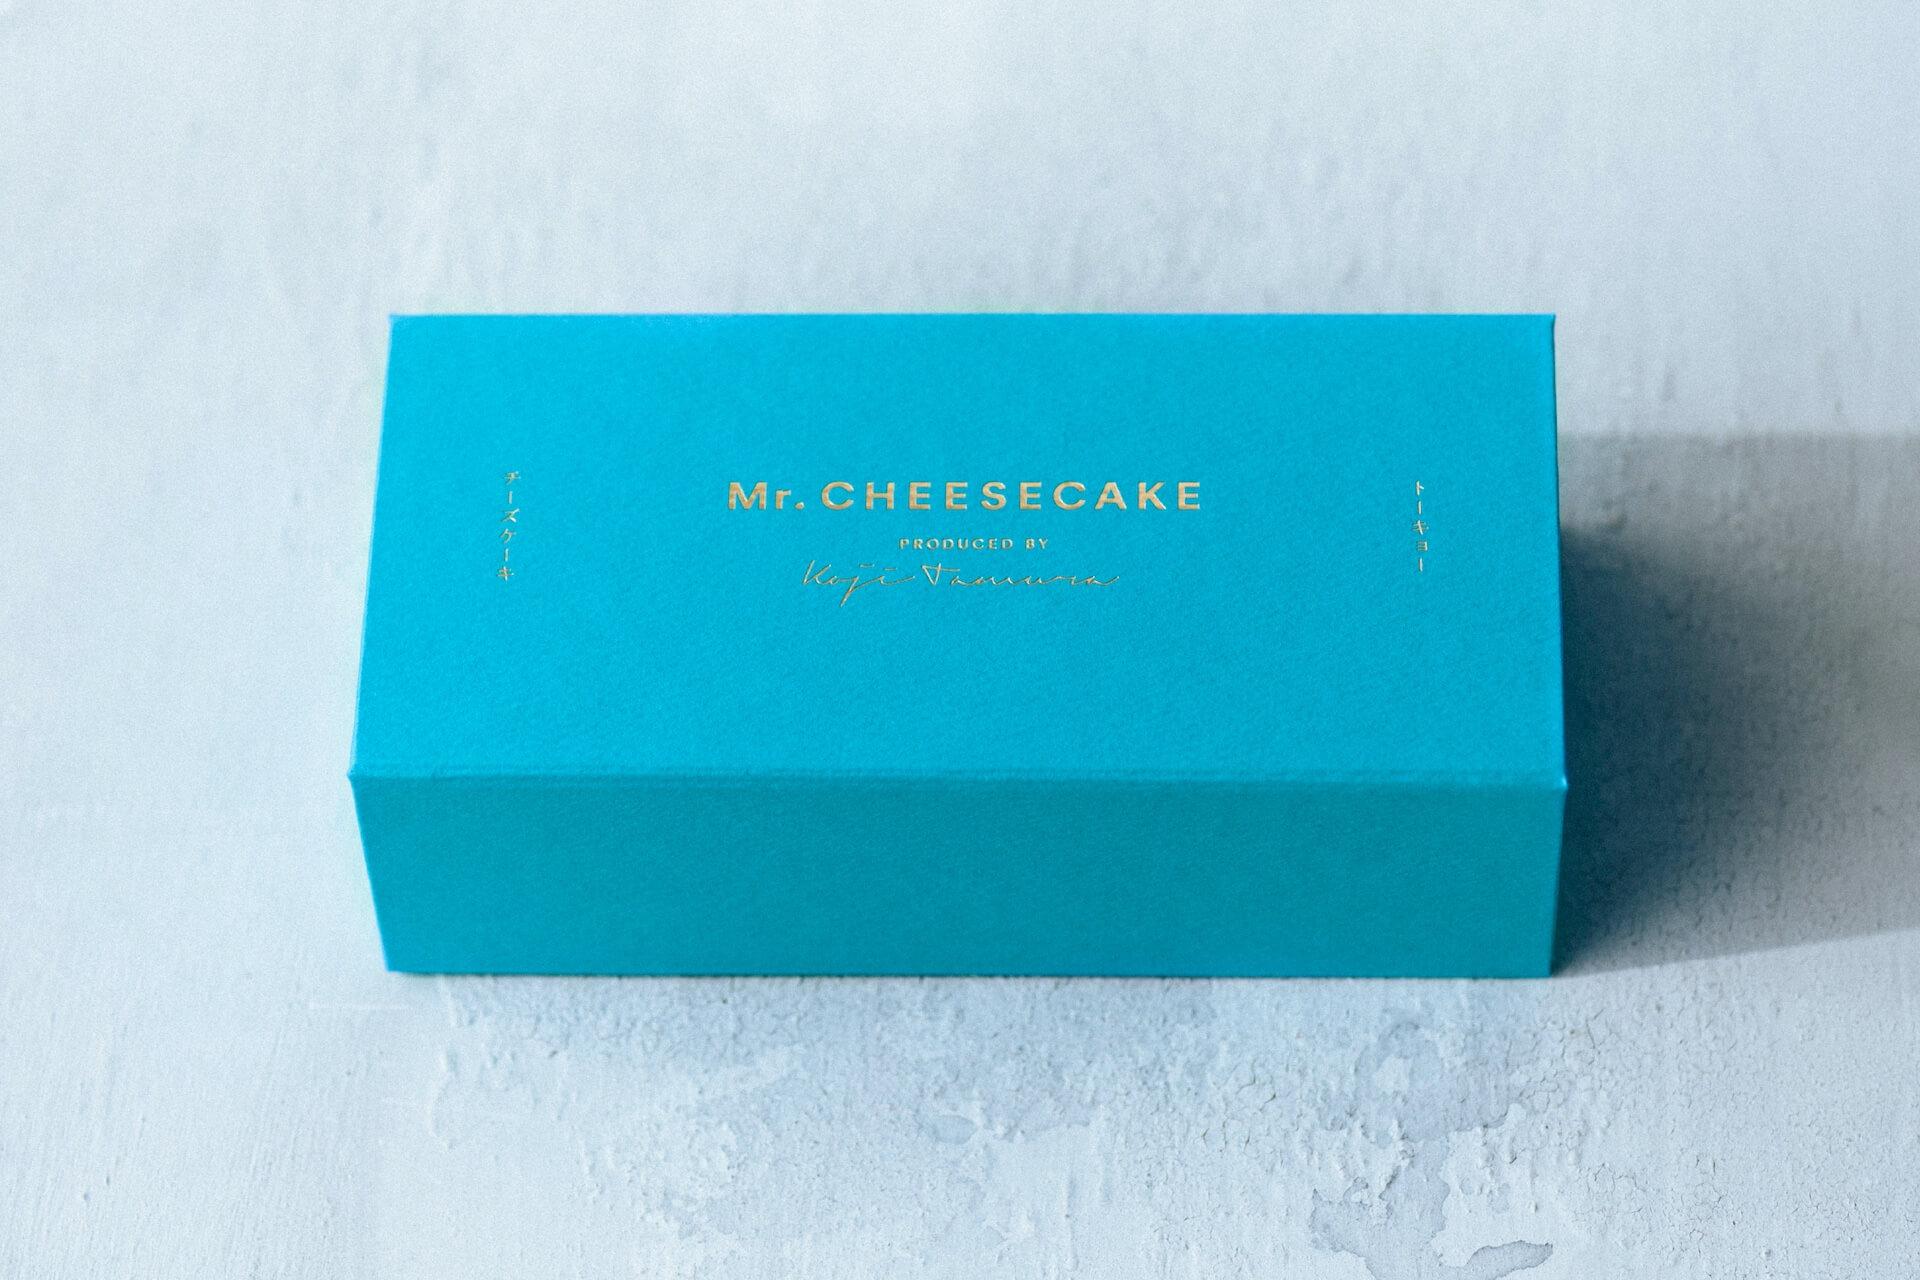 Mr. CHEESECAKEが、真夏の限定フレーバー「Mr. CHEESECAKE UN ETE mango passion」を4日間のみ発売! gourmet_210721_cheesecake4